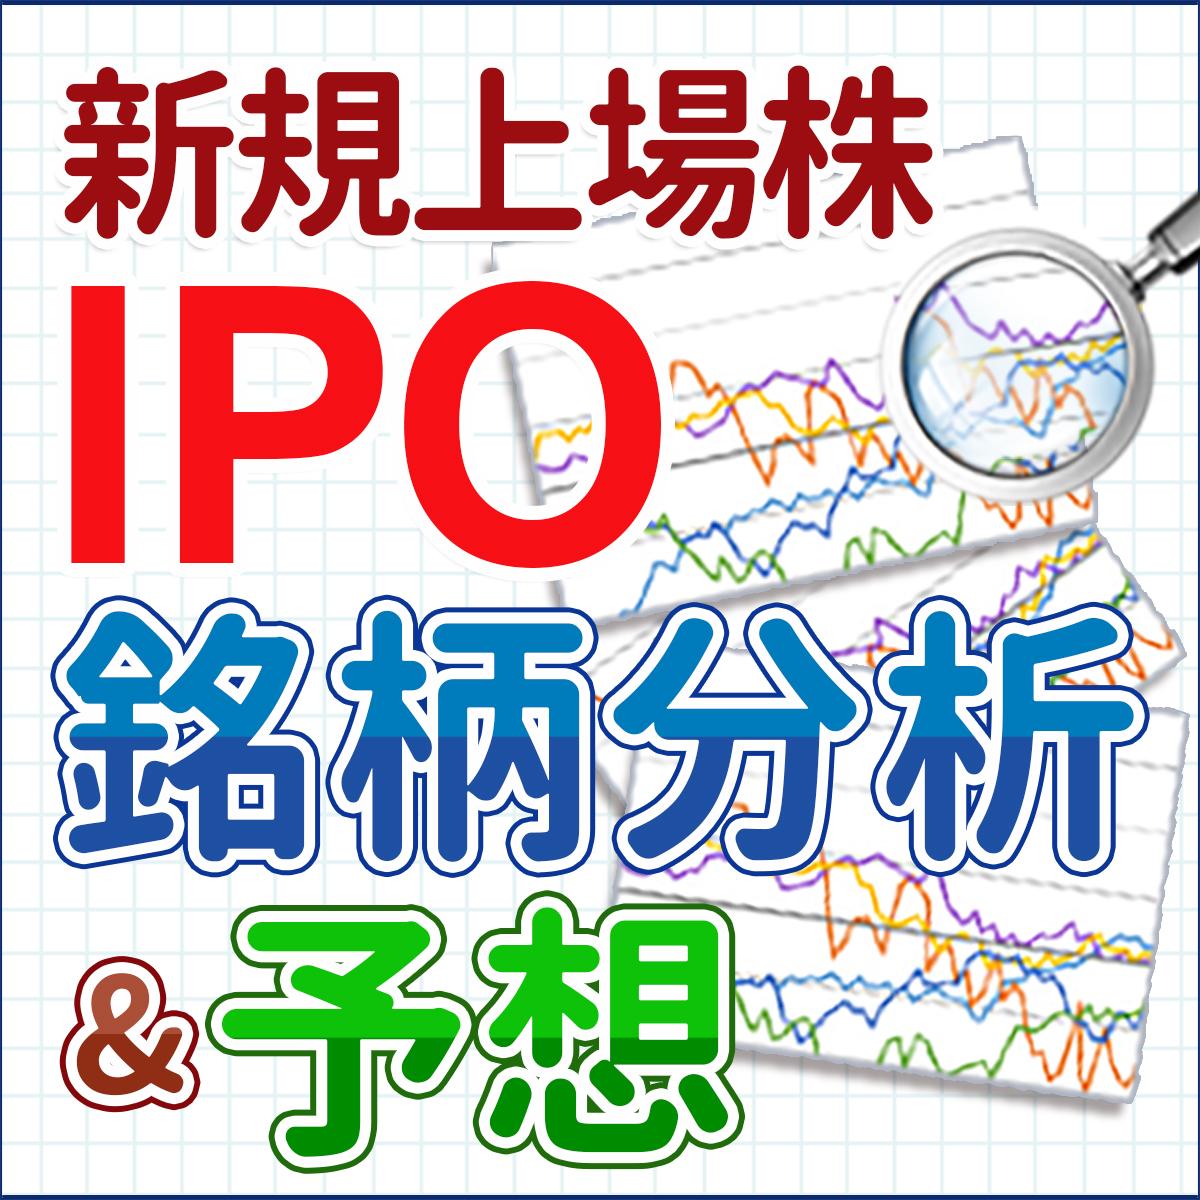 「HENNGE(ヘンゲ)」のIPO情報総まとめ! スケジュールから幹事証券、注目度、銘柄分析、 他のクラウド ...